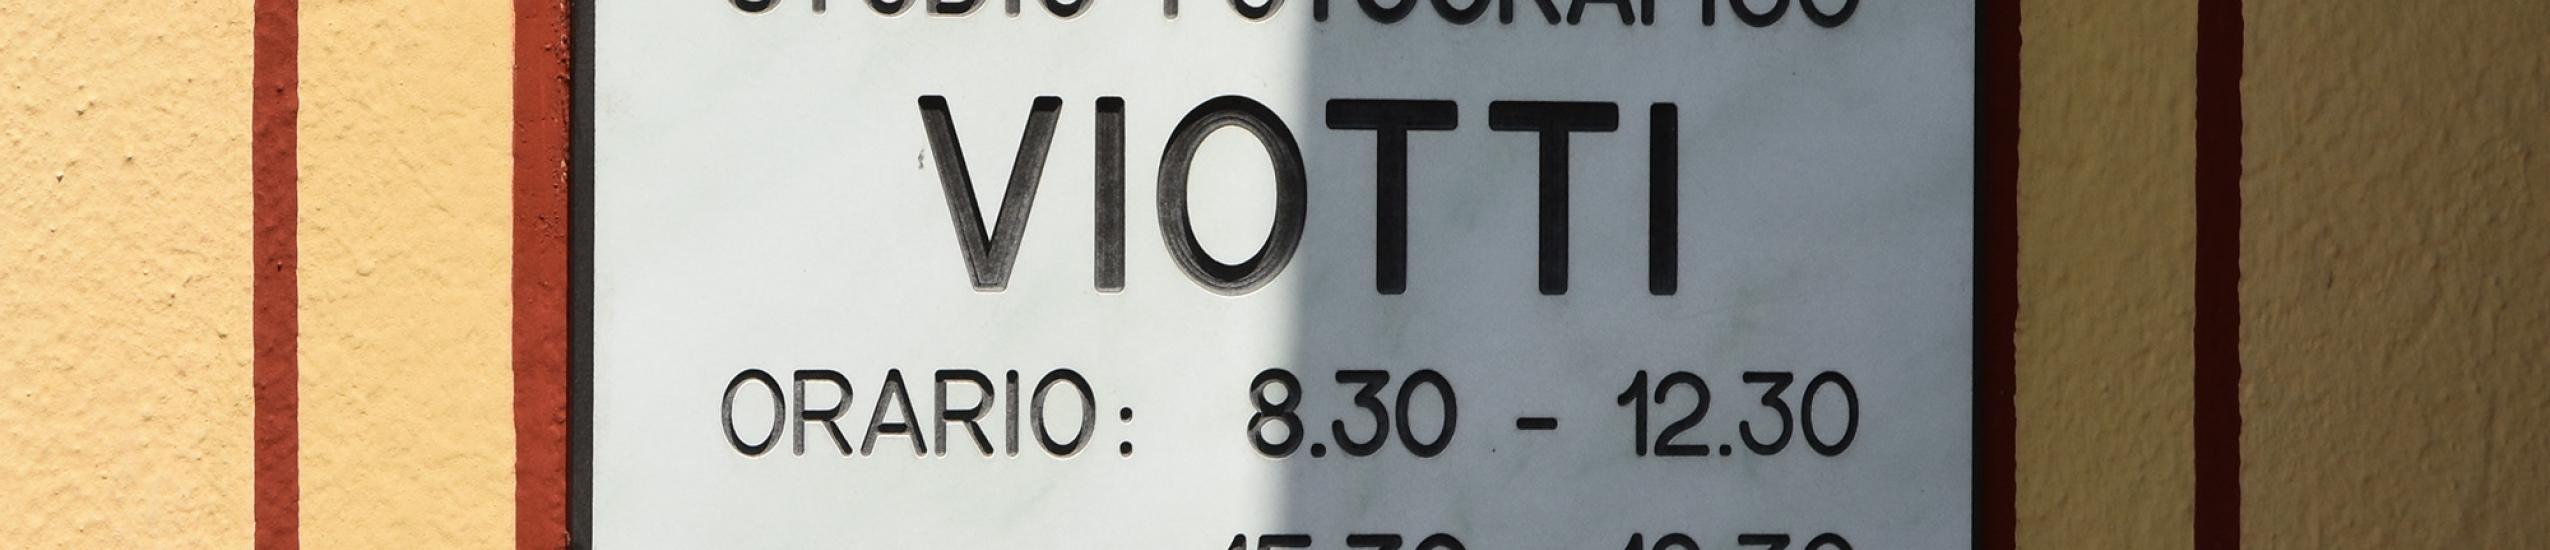 Foto Viotti